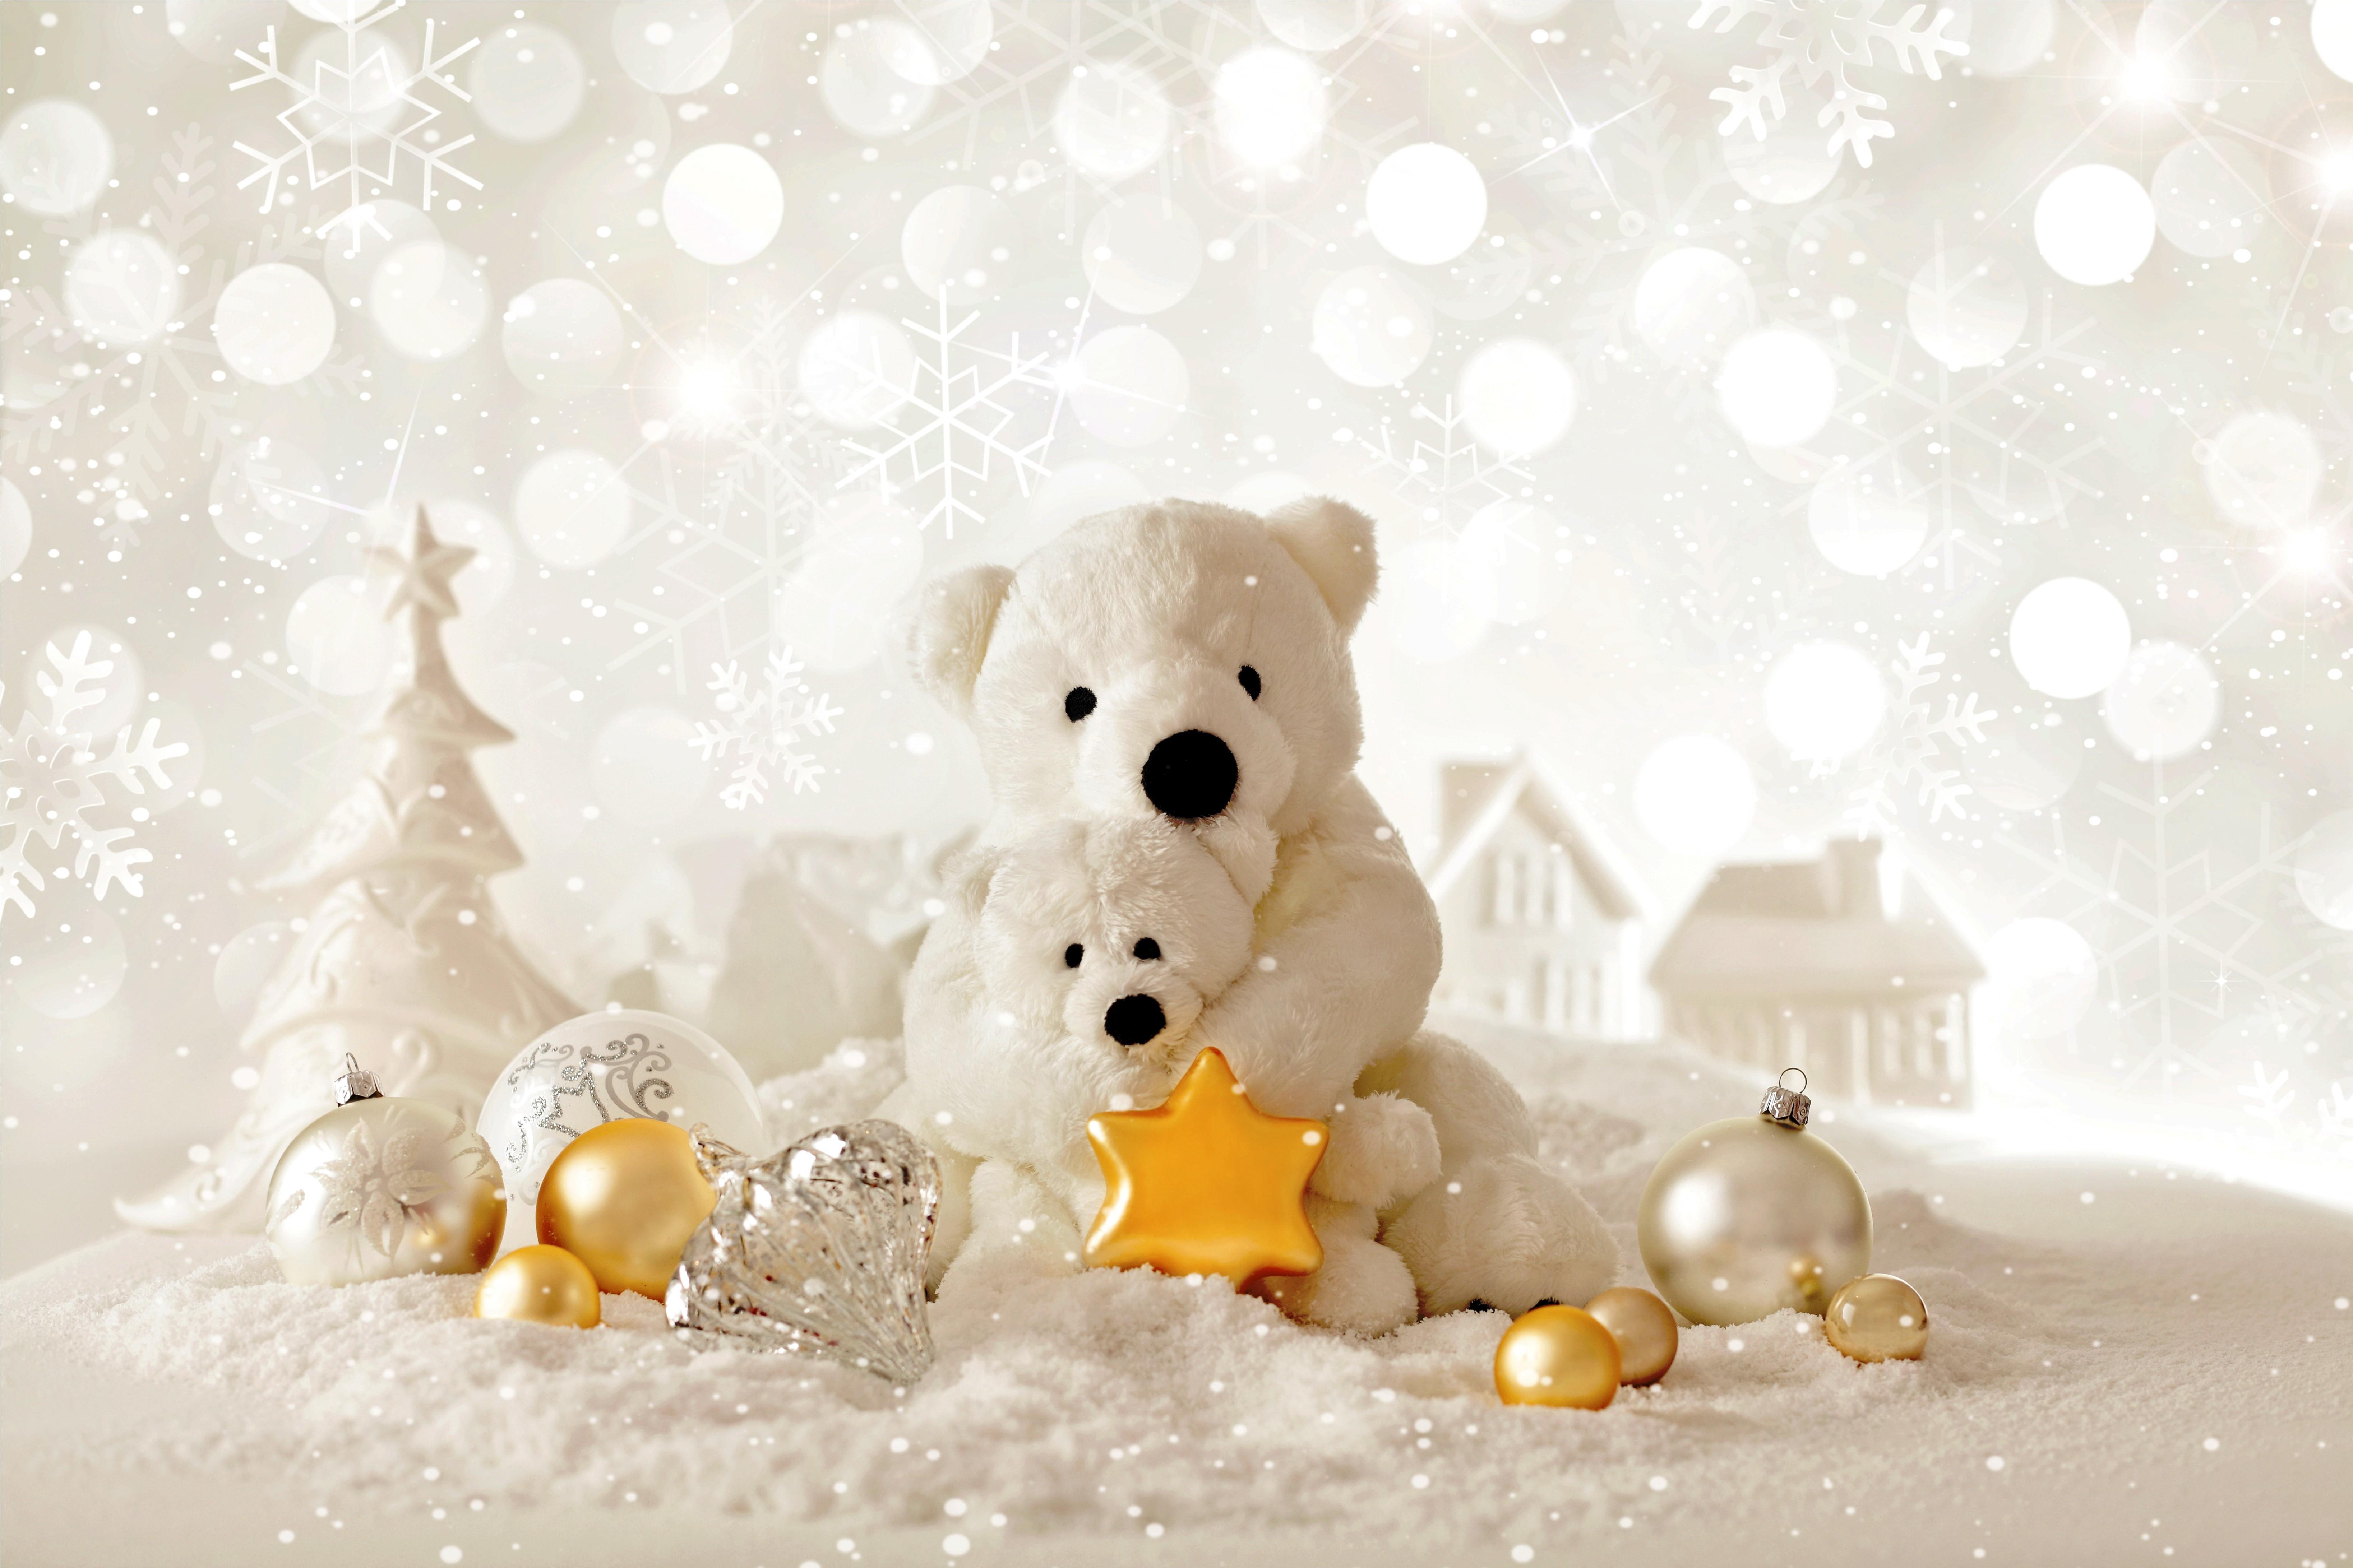 Wallpaper Christmas New Year Bear decorations Holidays 6550x4366